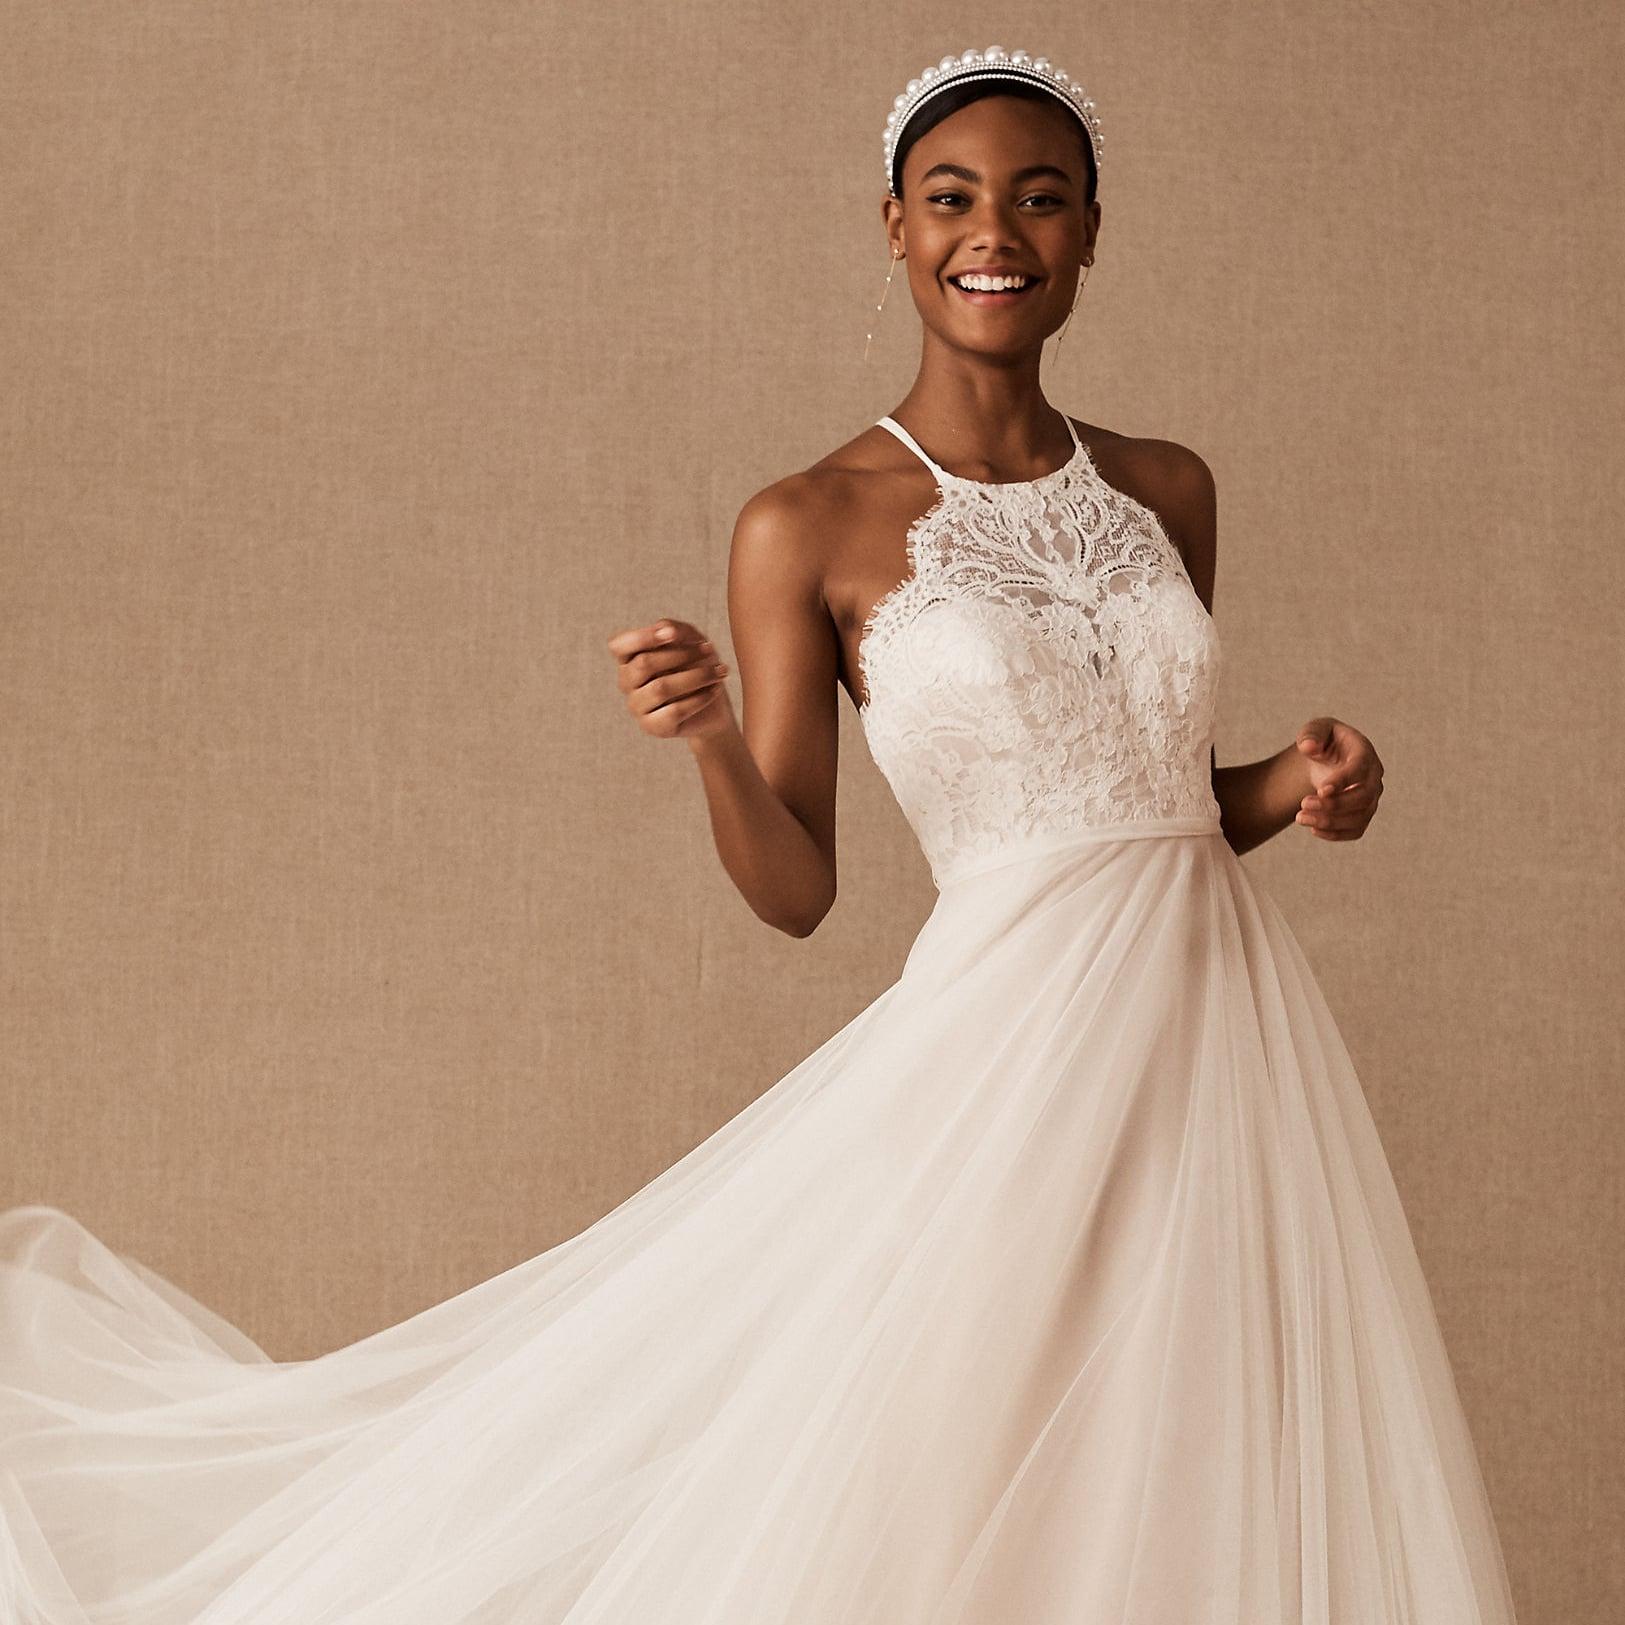 The Best Bhldn Wedding Gowns 2020 Popsugar Fashion